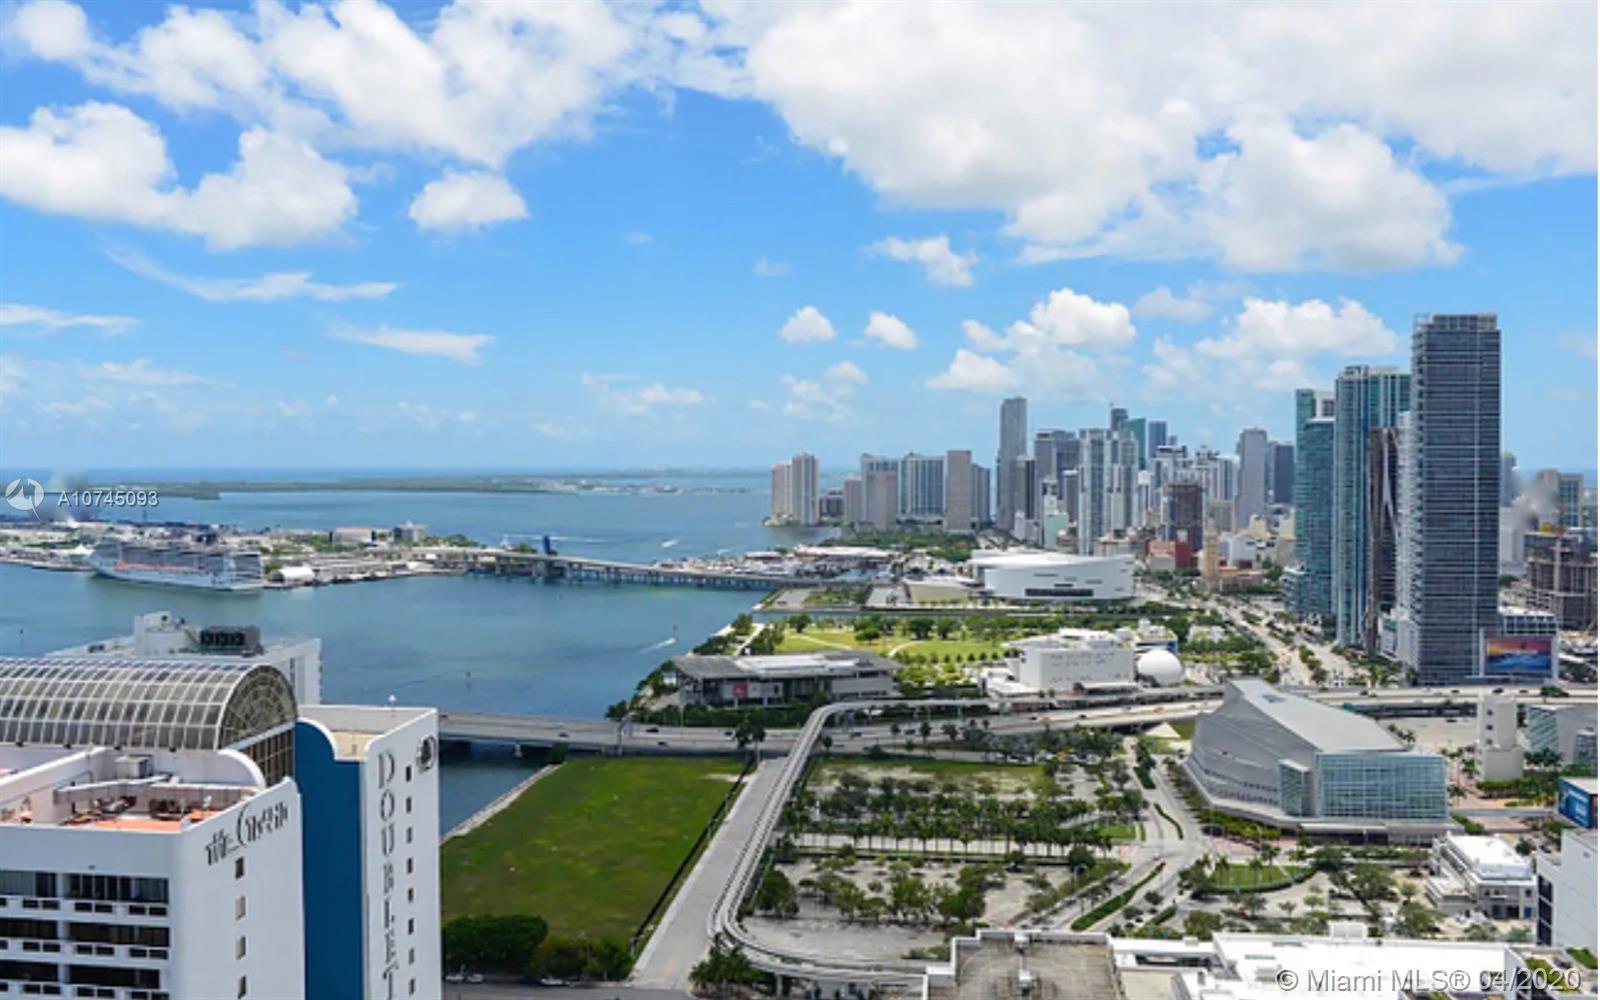 1750 N Bayshore Dr # 5214, Miami, Florida 33132, 2 Bedrooms Bedrooms, ,2 BathroomsBathrooms,Residential,For Sale,1750 N Bayshore Dr # 5214,A10745093